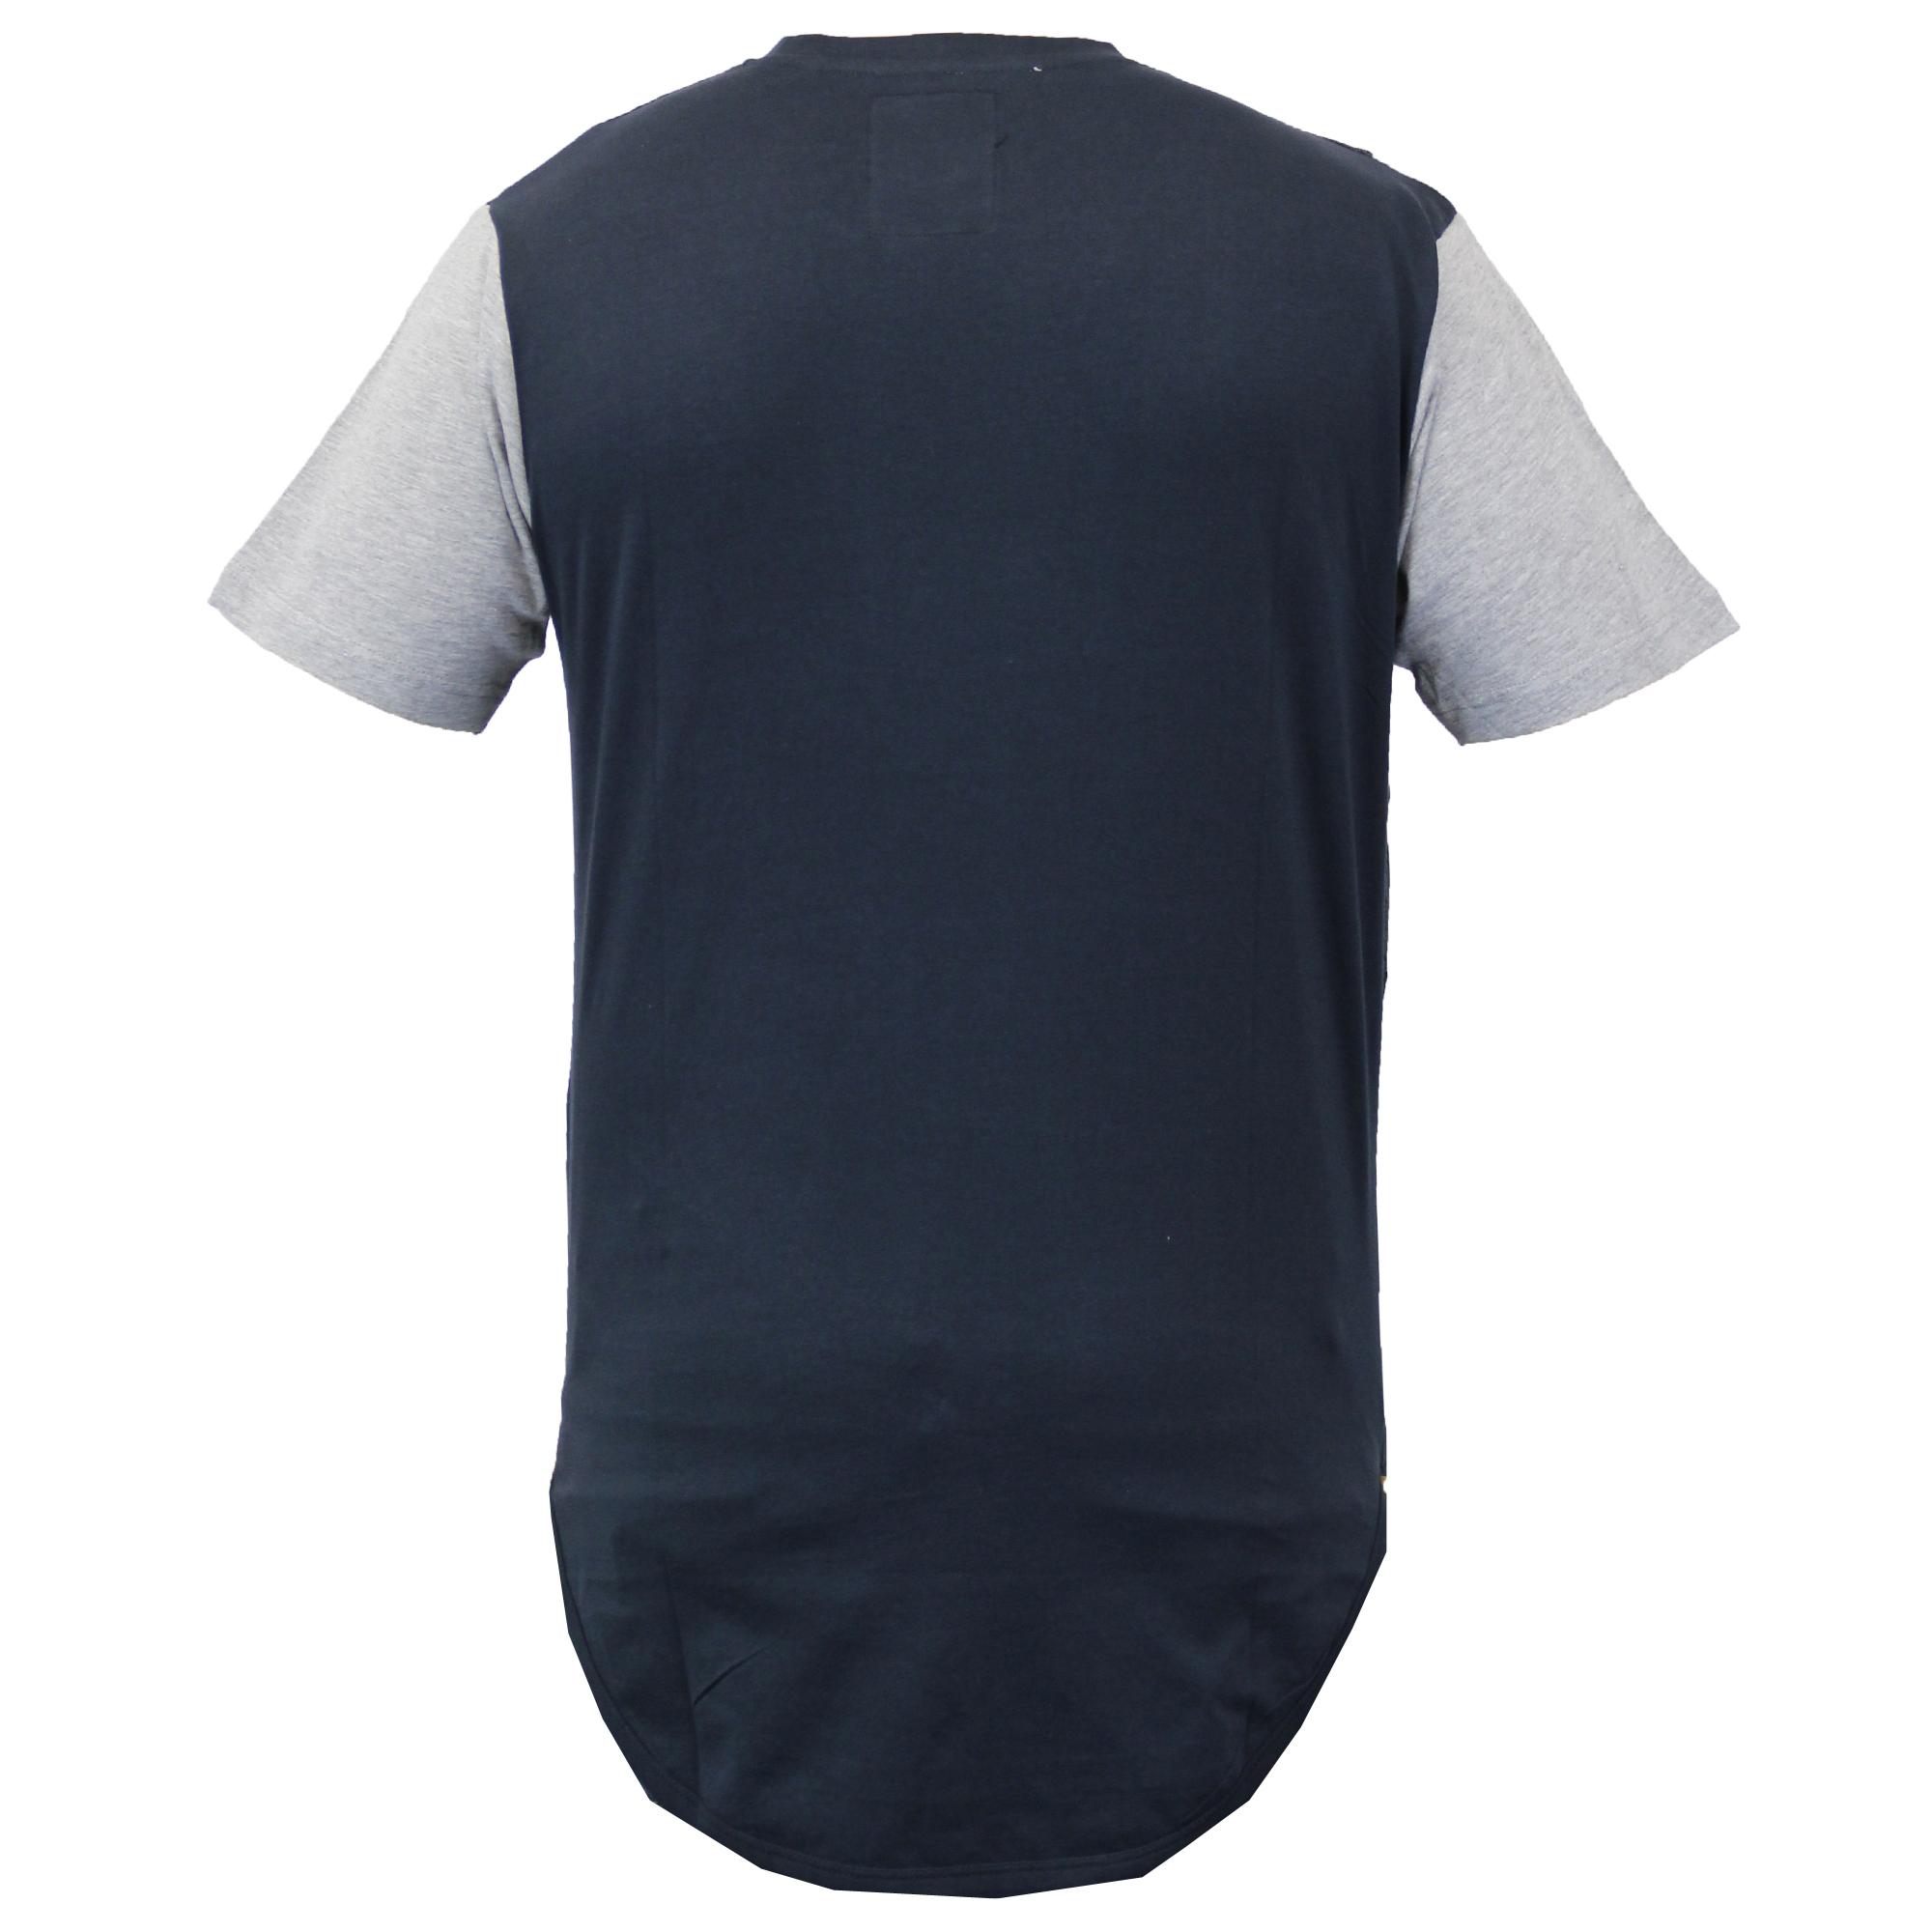 Mens long line short sleeved mesh t shirts by soul star for Long line short sleeve t shirt